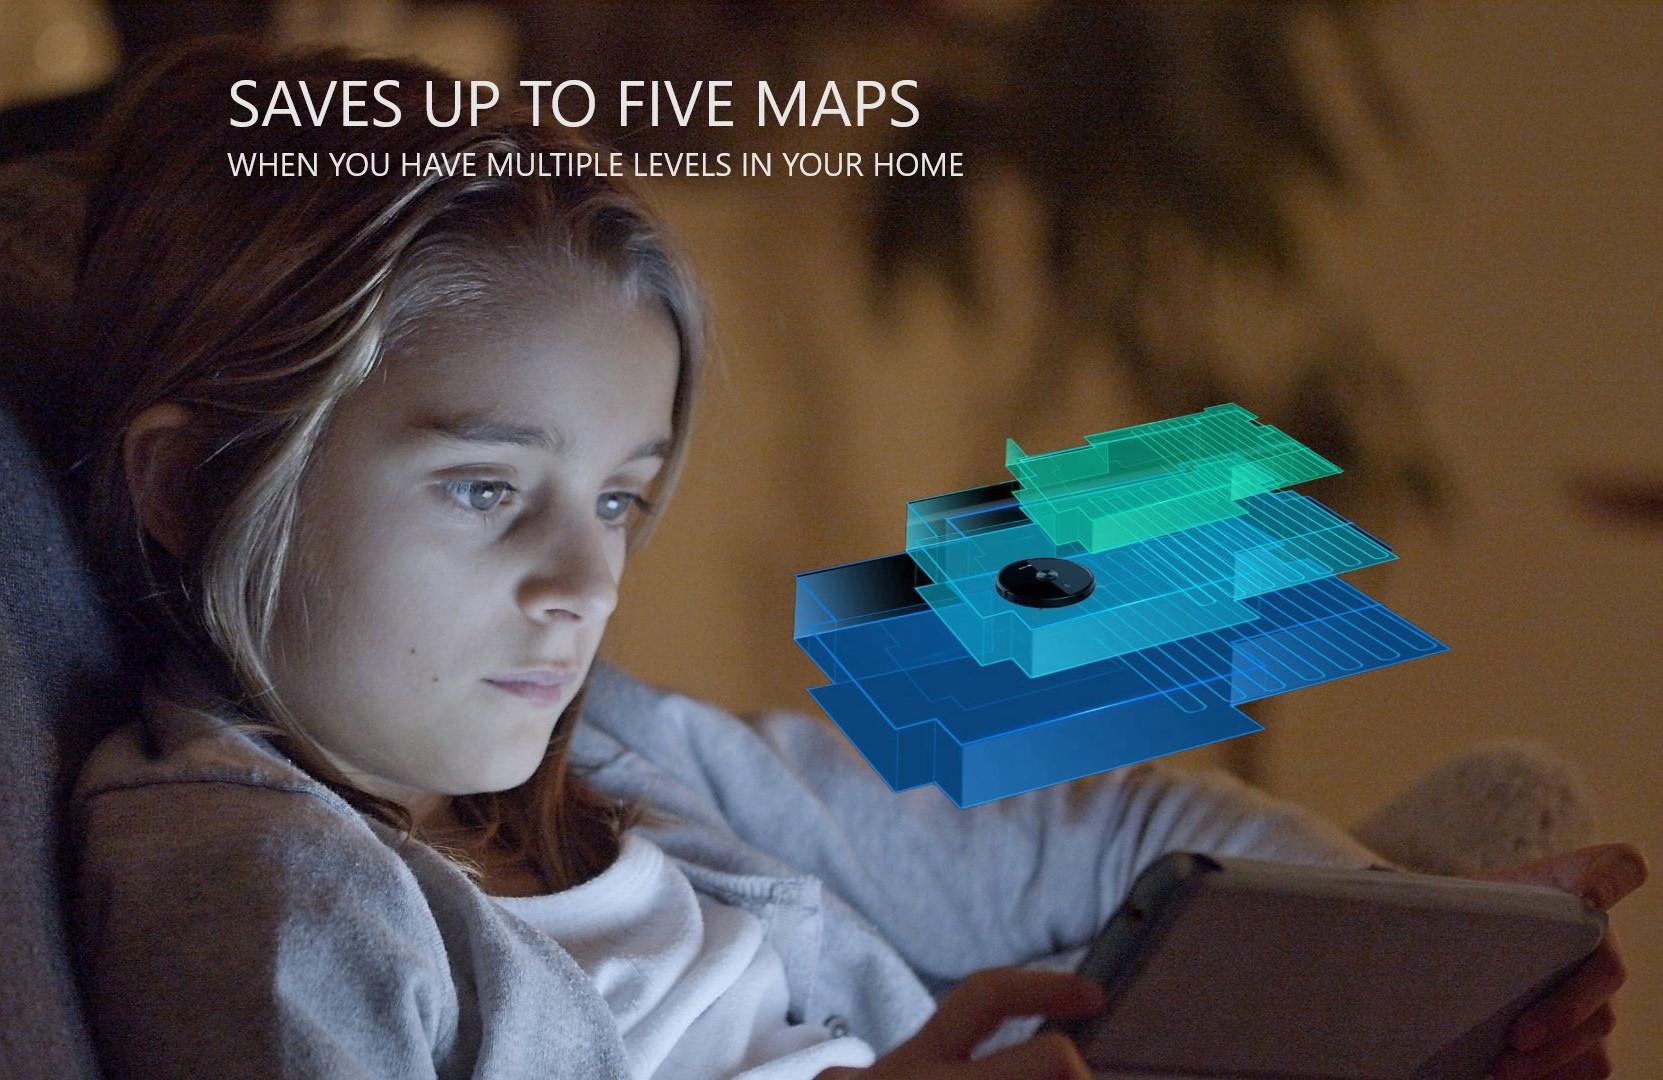 Liectroux Saves 5 maps